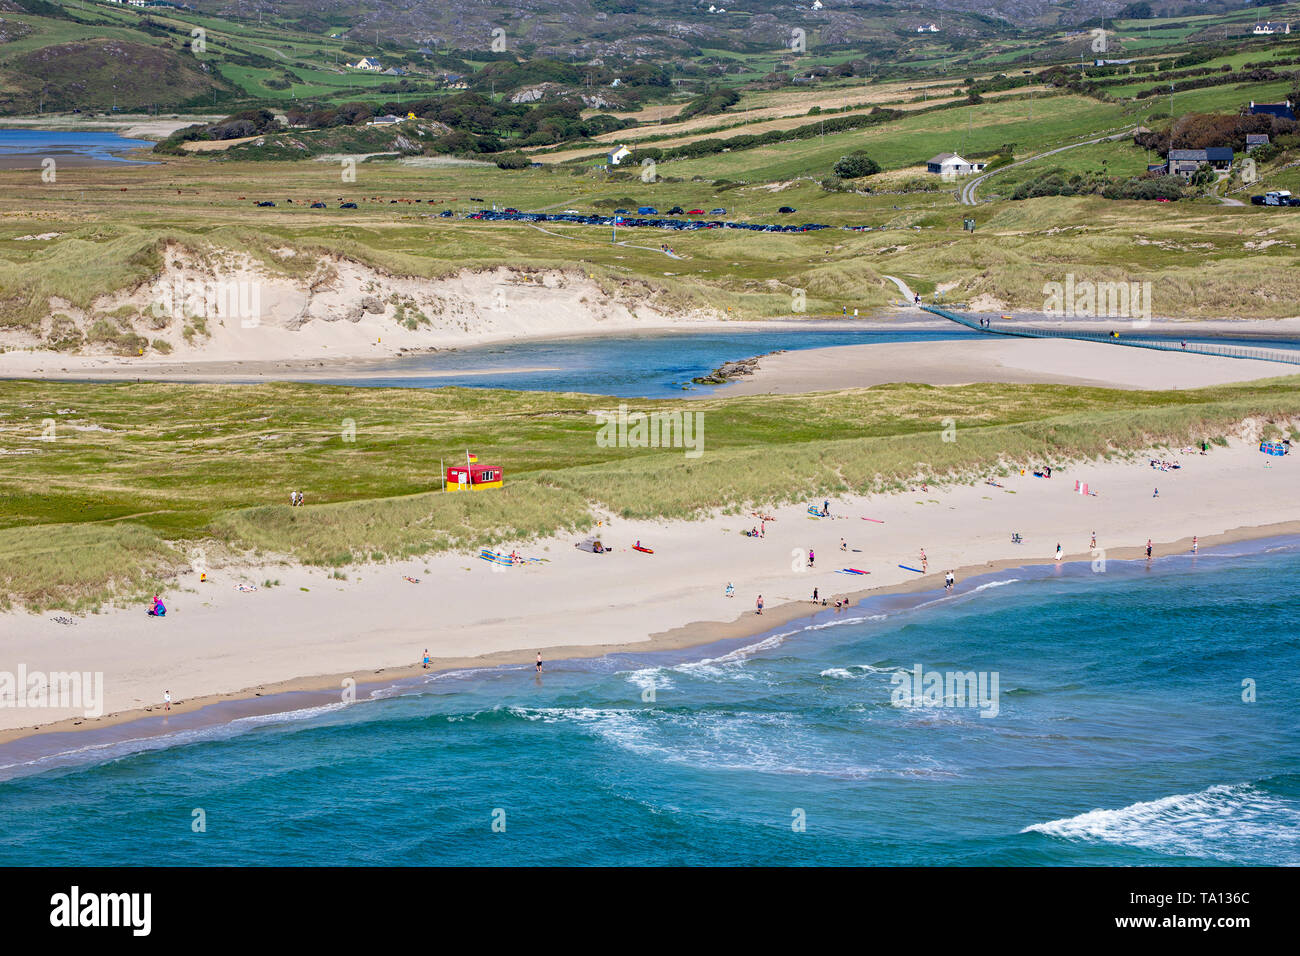 Barleycove beach, aka Barlycove beach on the Wild Atlantic Way, County Cork, Republic of Ireland.  Eire. - Stock Image